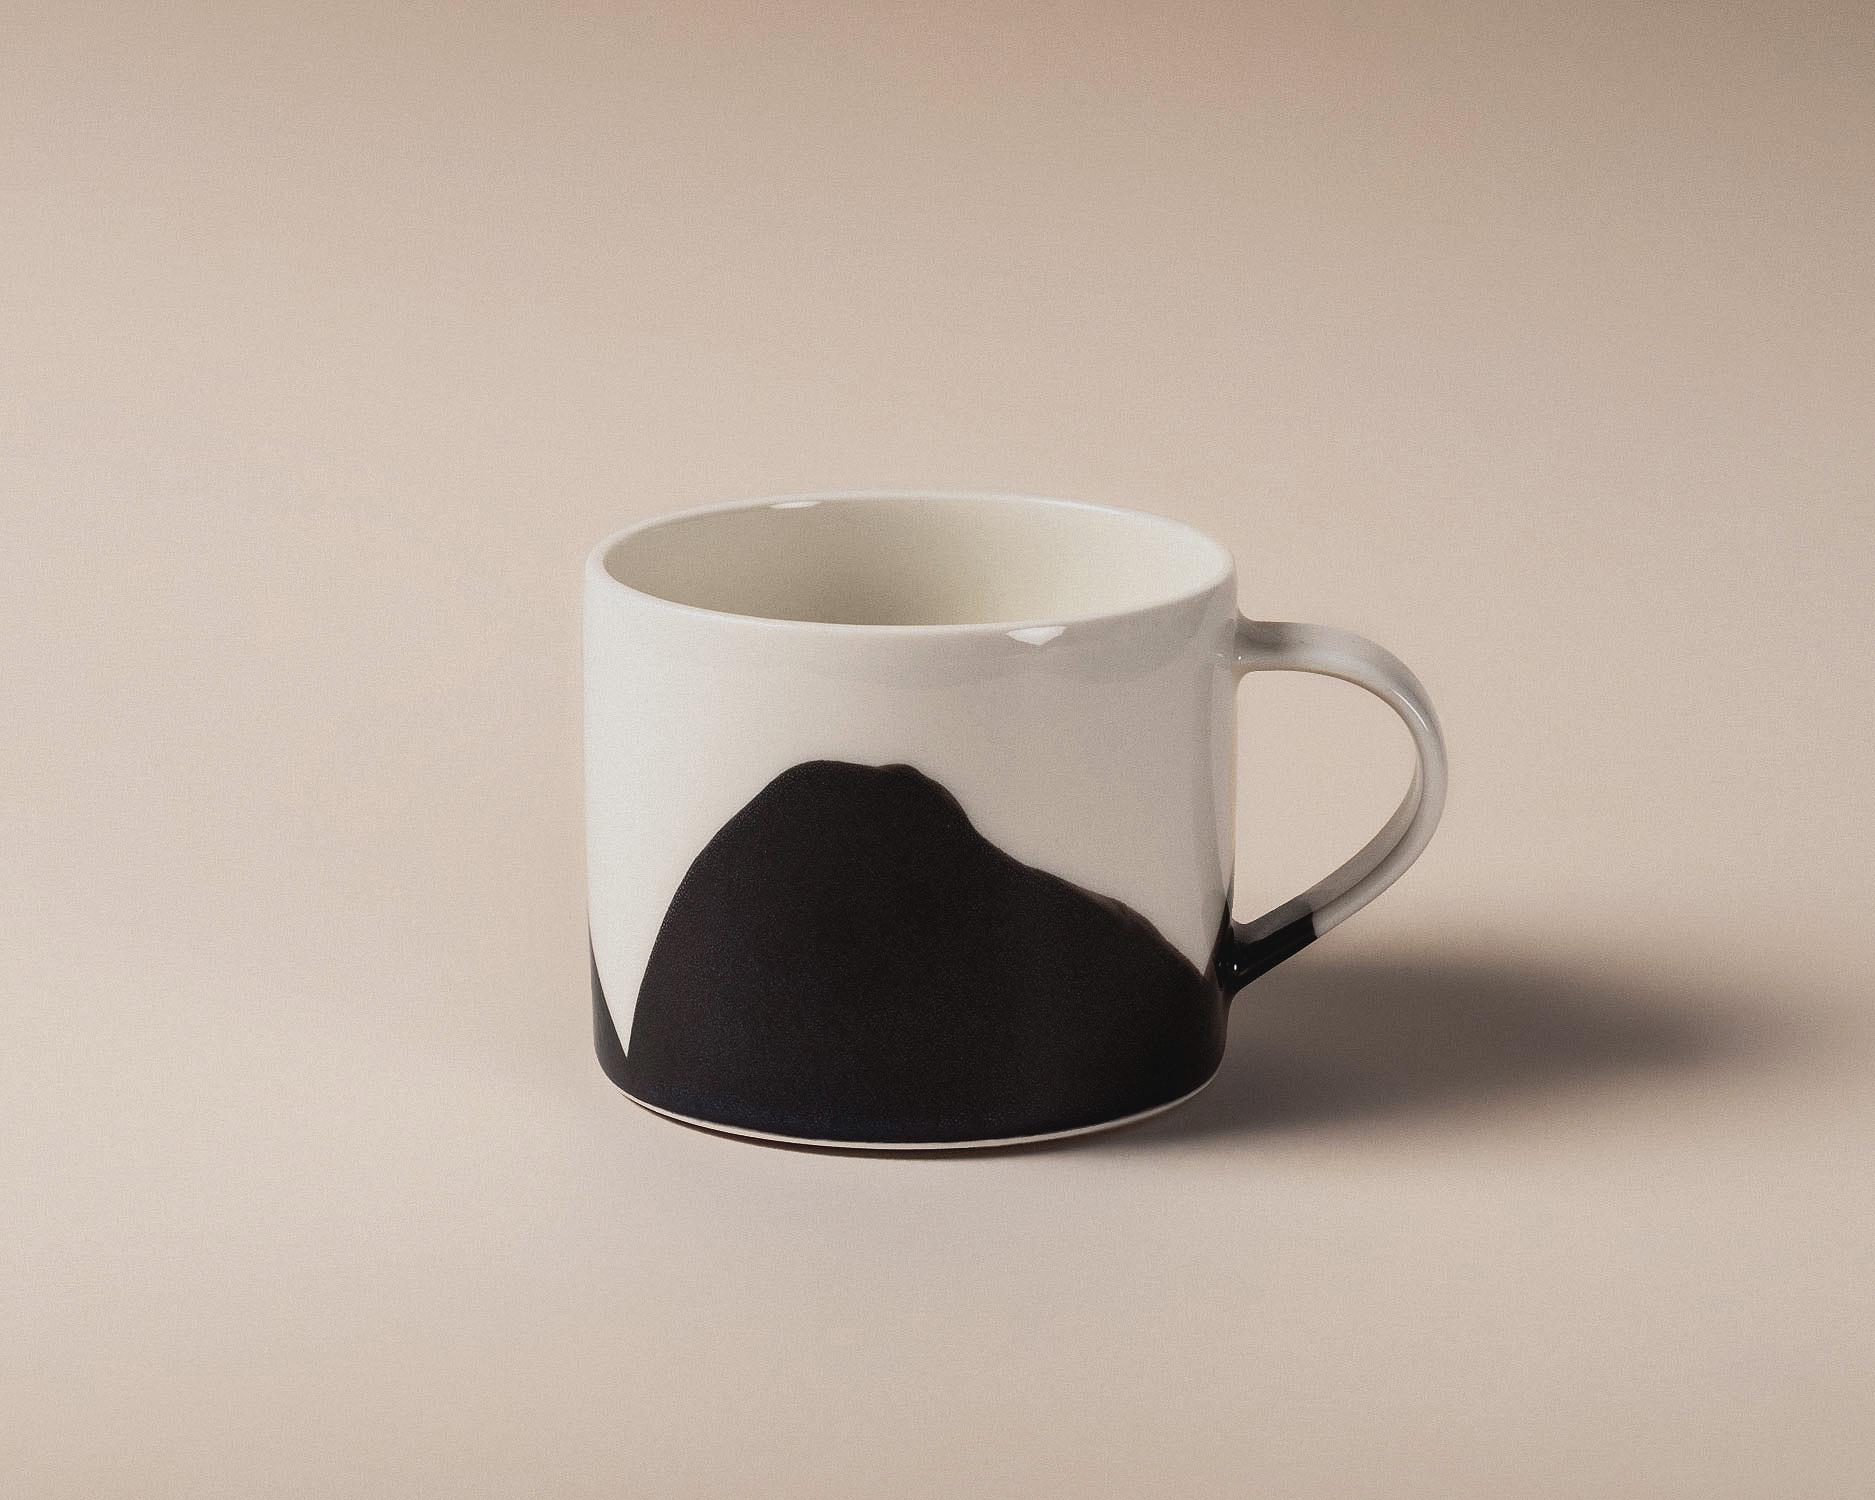 berg-tea-cup-1 copy.jpg